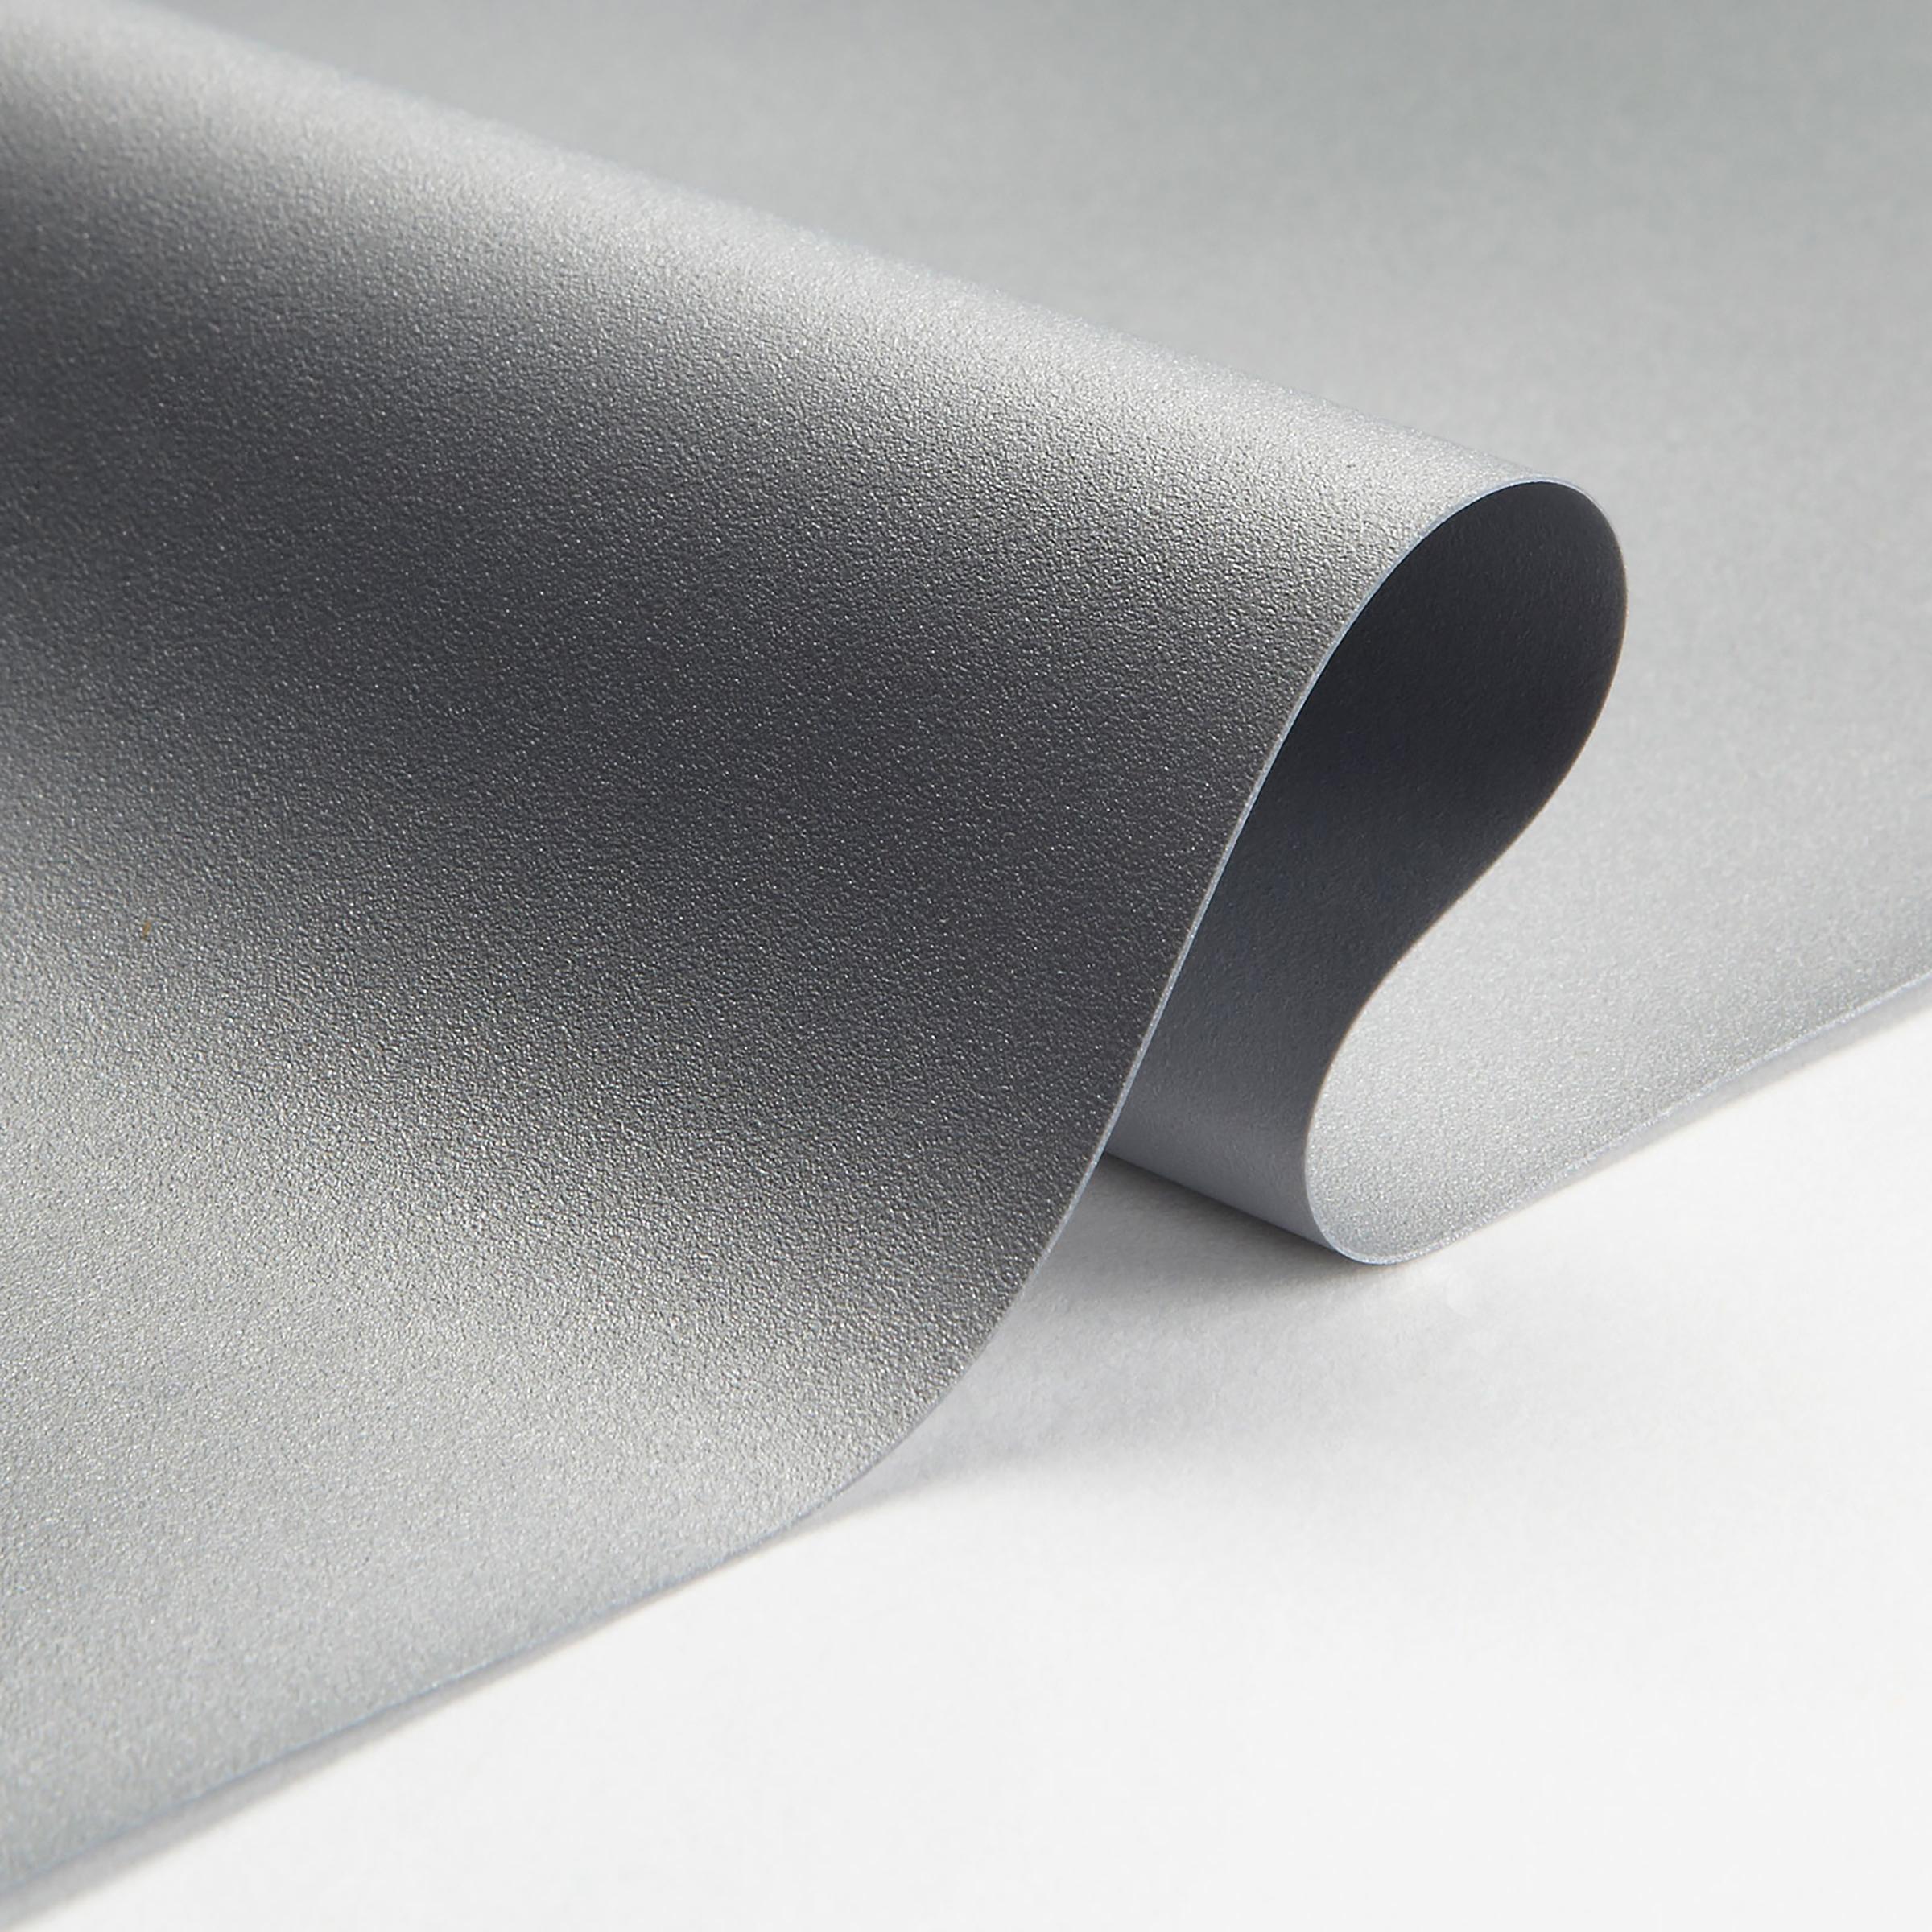 SilverScreen Projector Screen Material